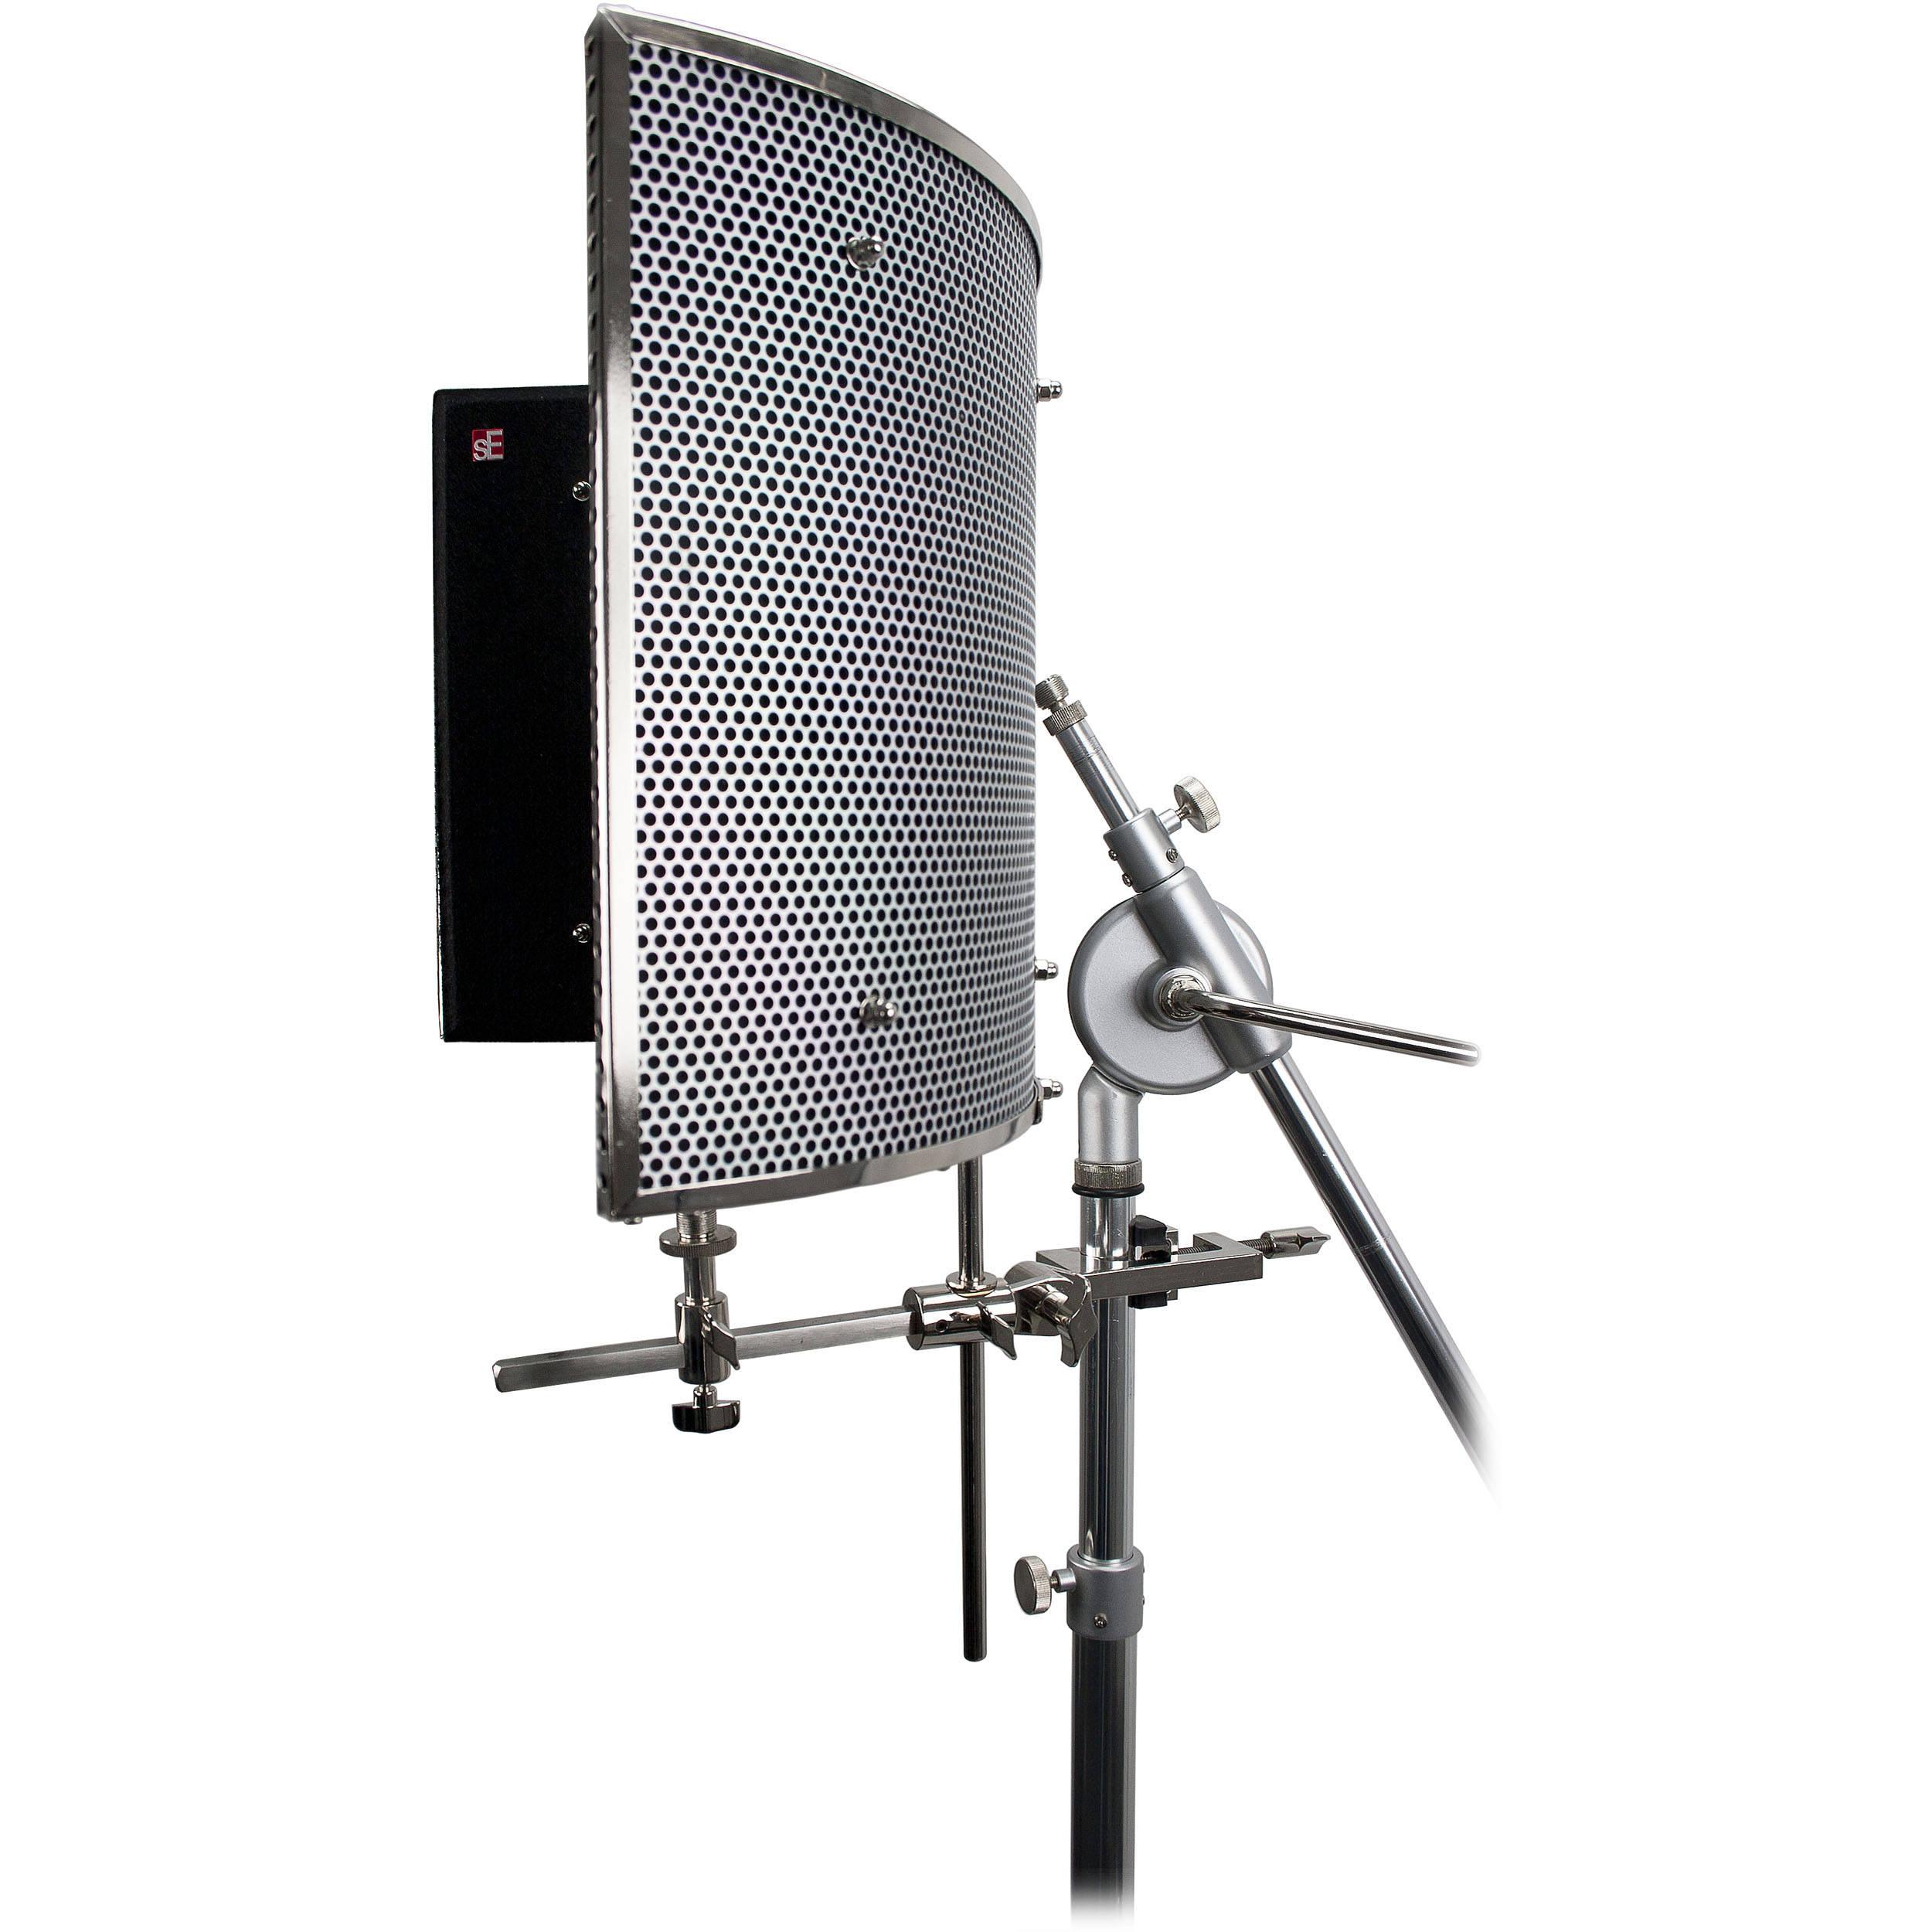 se electronics reflexion filter pro acoustic see rf pro b h. Black Bedroom Furniture Sets. Home Design Ideas